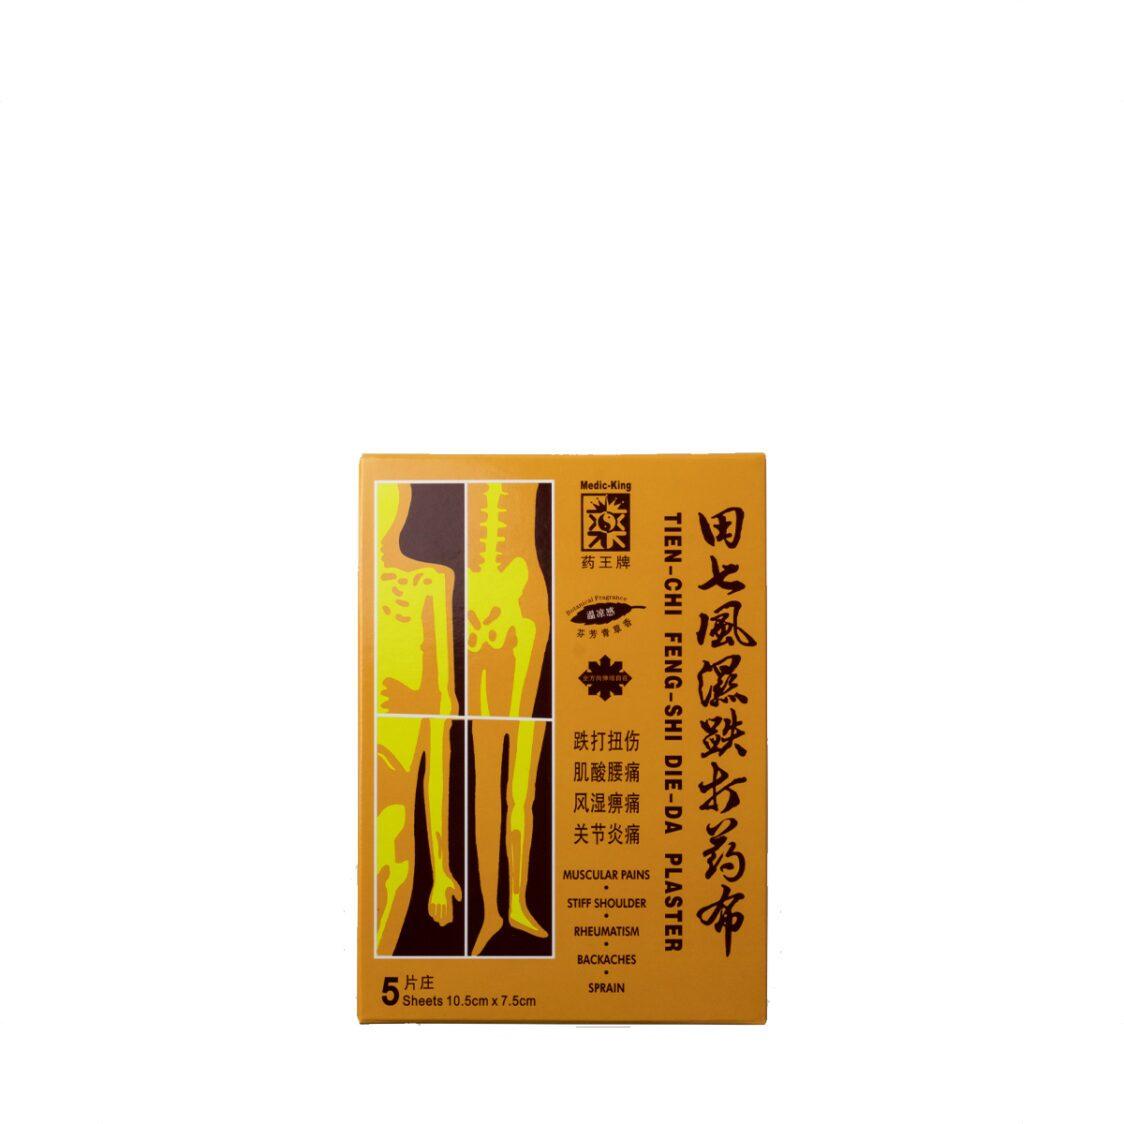 Winlykah TCM Mediking Tien-Chi Feng-Shi Die-Da Plaster 5 Sheets